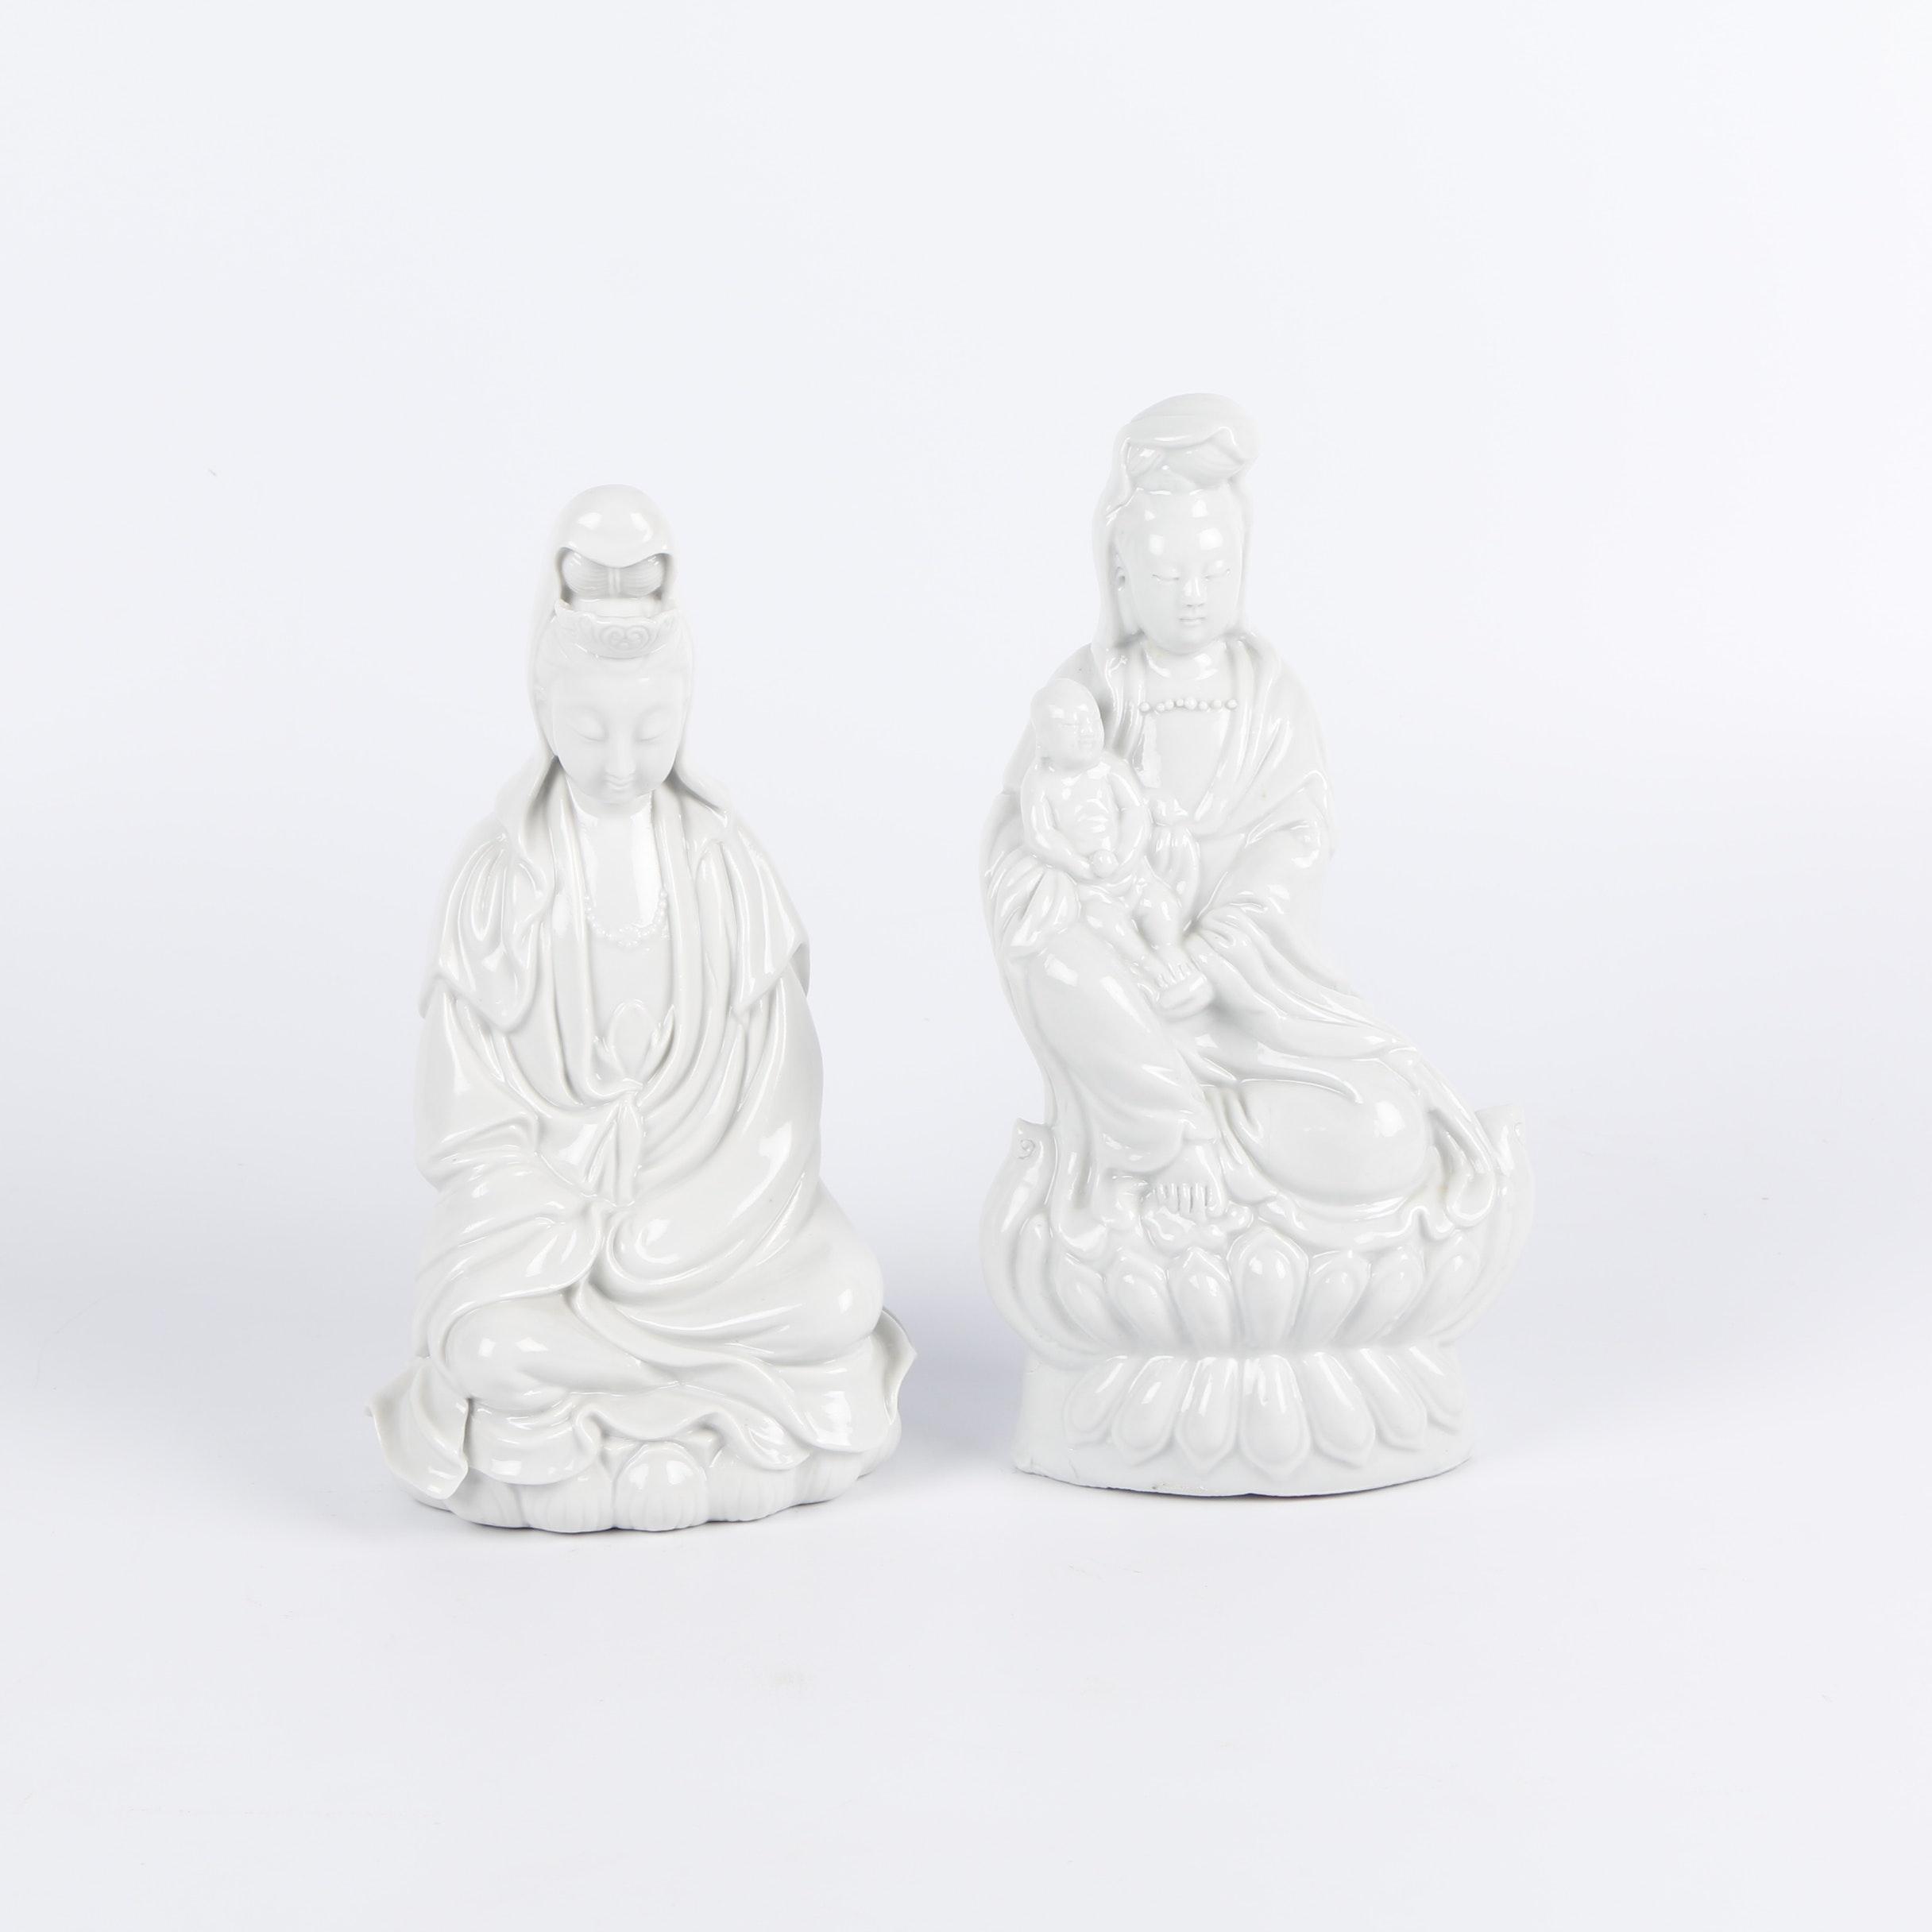 Chinese Guanyin Blanc-de-Chine Porcelain Figurines